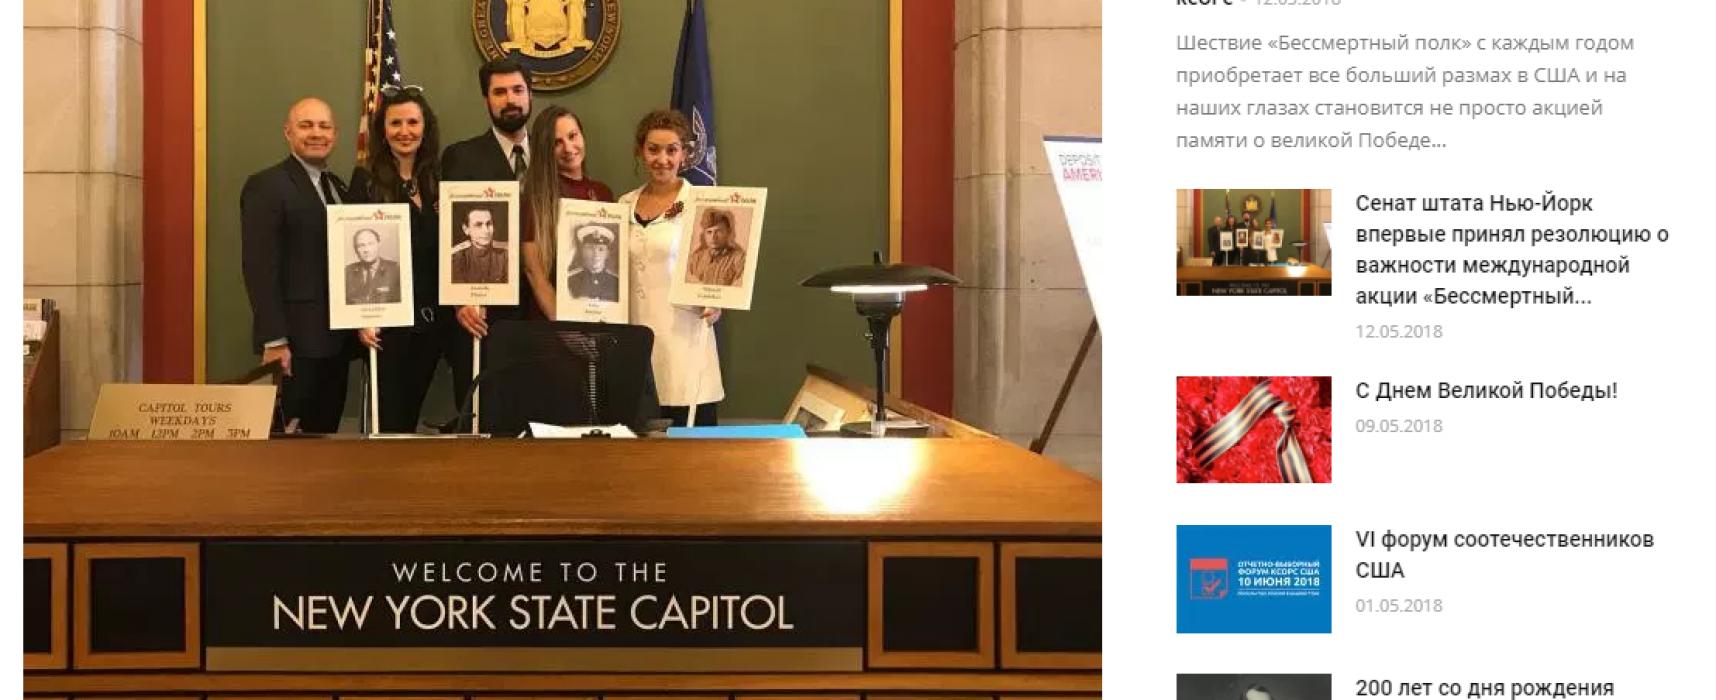 New York State Senate welcomes Russian propagandists